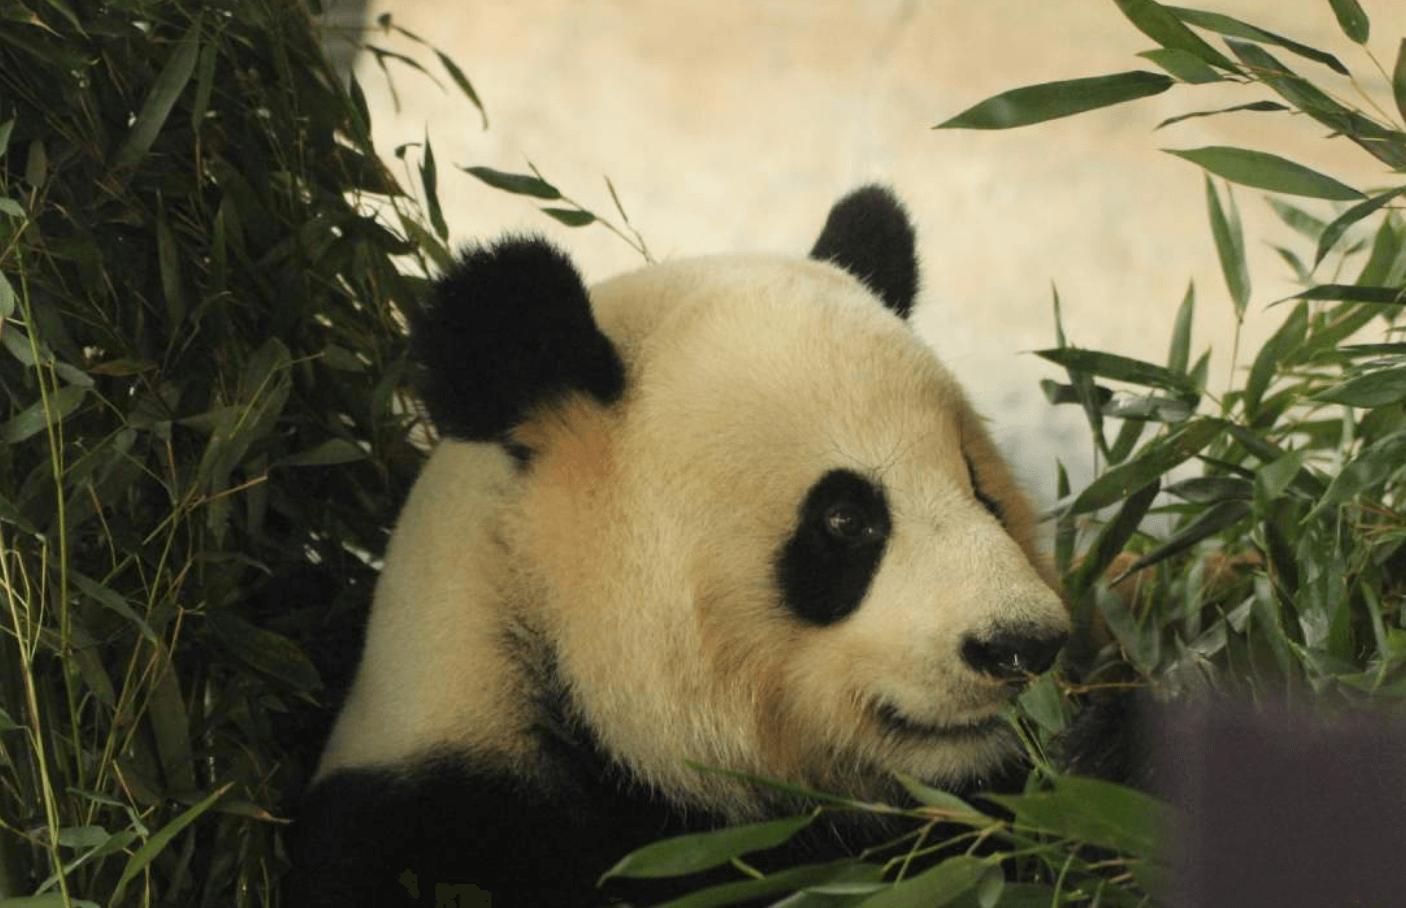 Tiergarten Berlin Panda by Patrick Jost